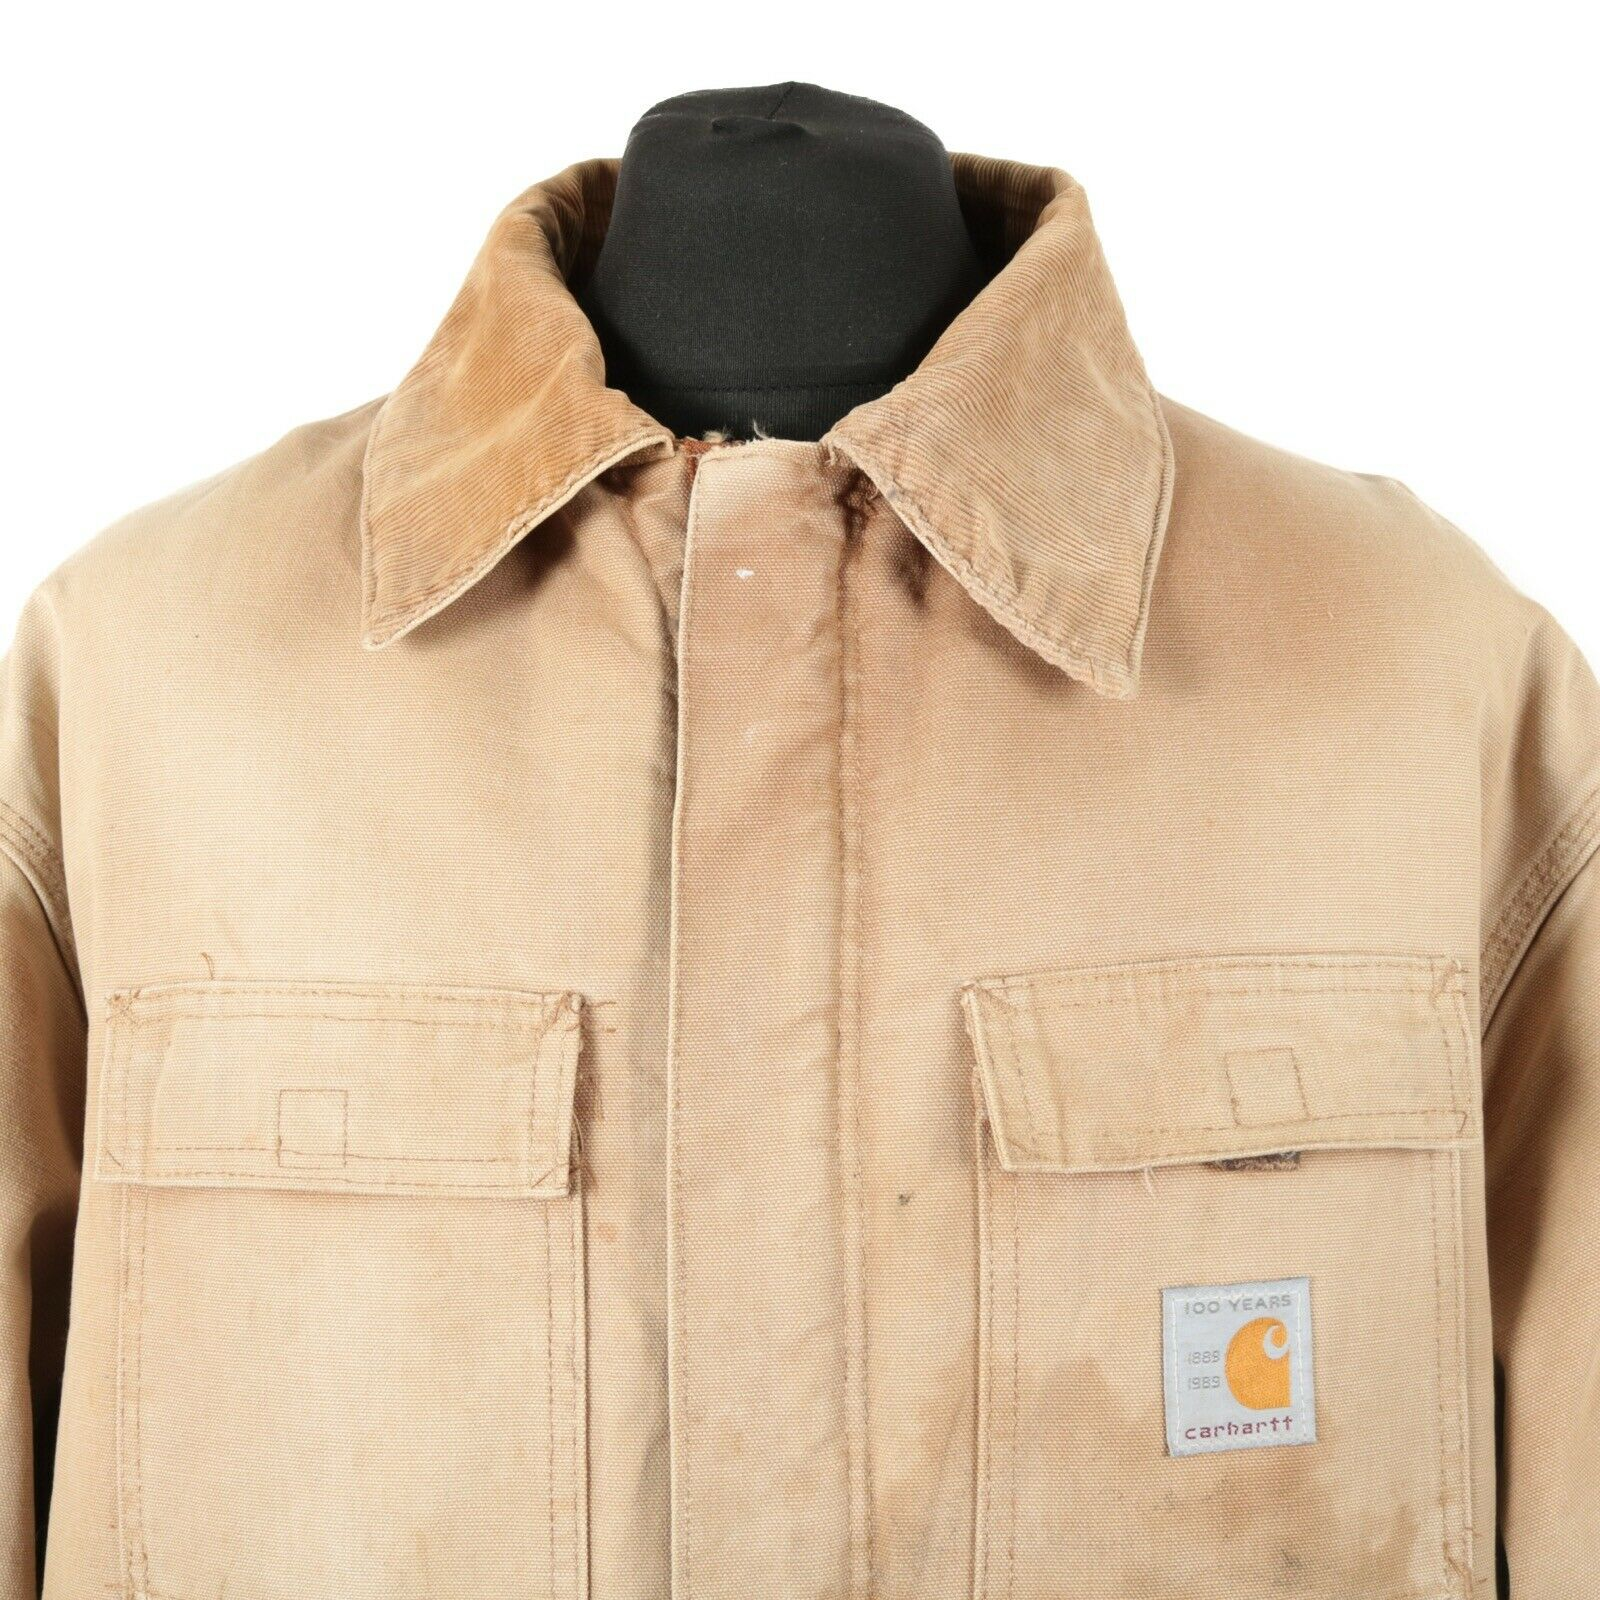 80s Vintage CARHARTT 100 Year Quilted Chore Jacket   Workwear Work Wear Coat